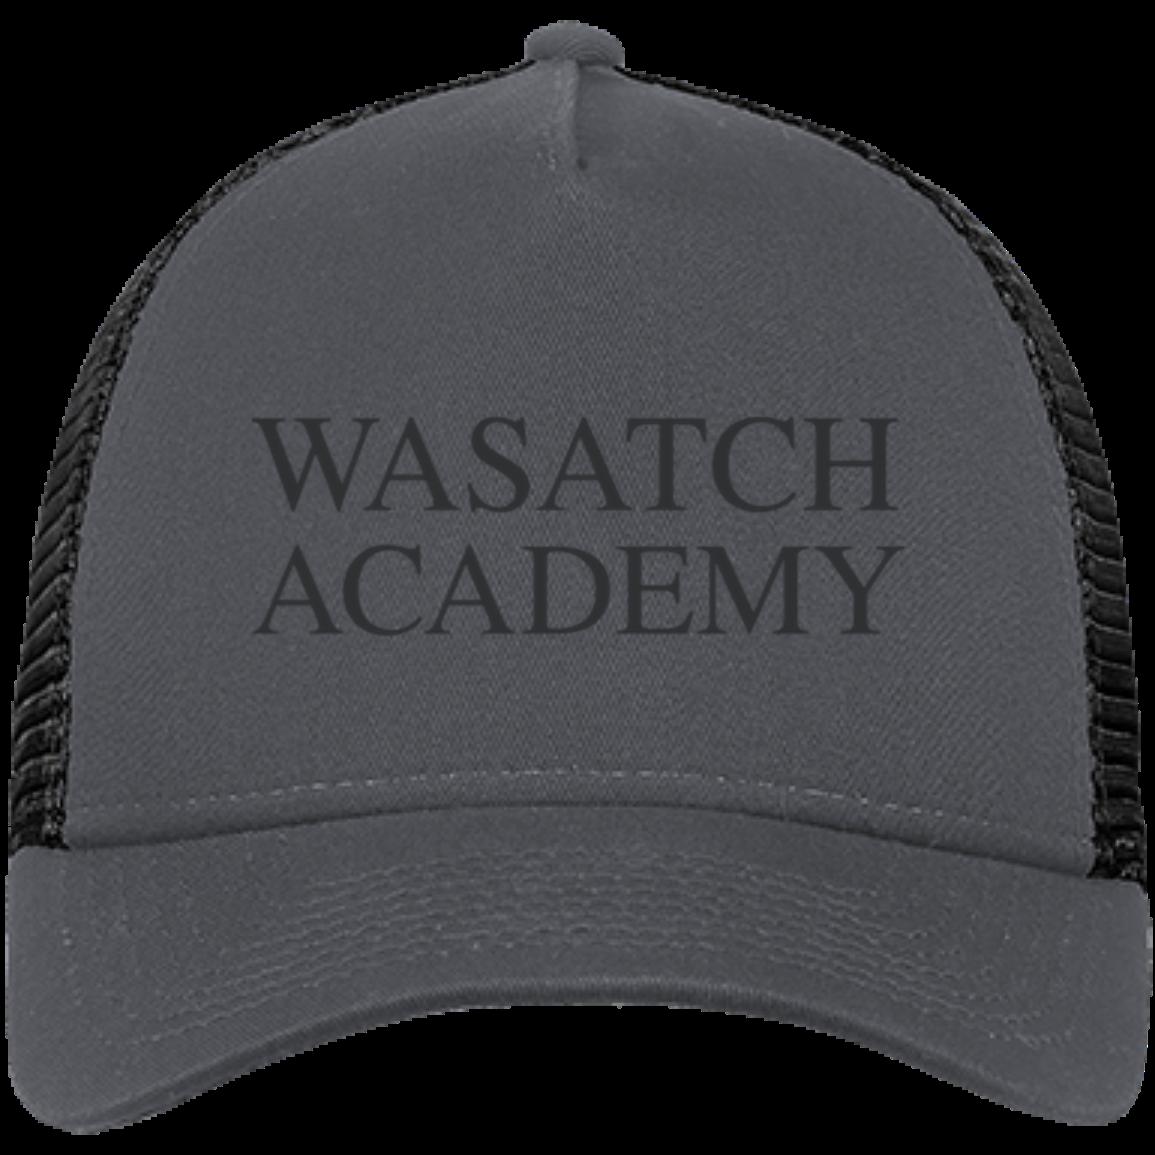 98c916cb21b03 Wasatch Academy New Era Snapback Trucker Cap - SpiritShop.com